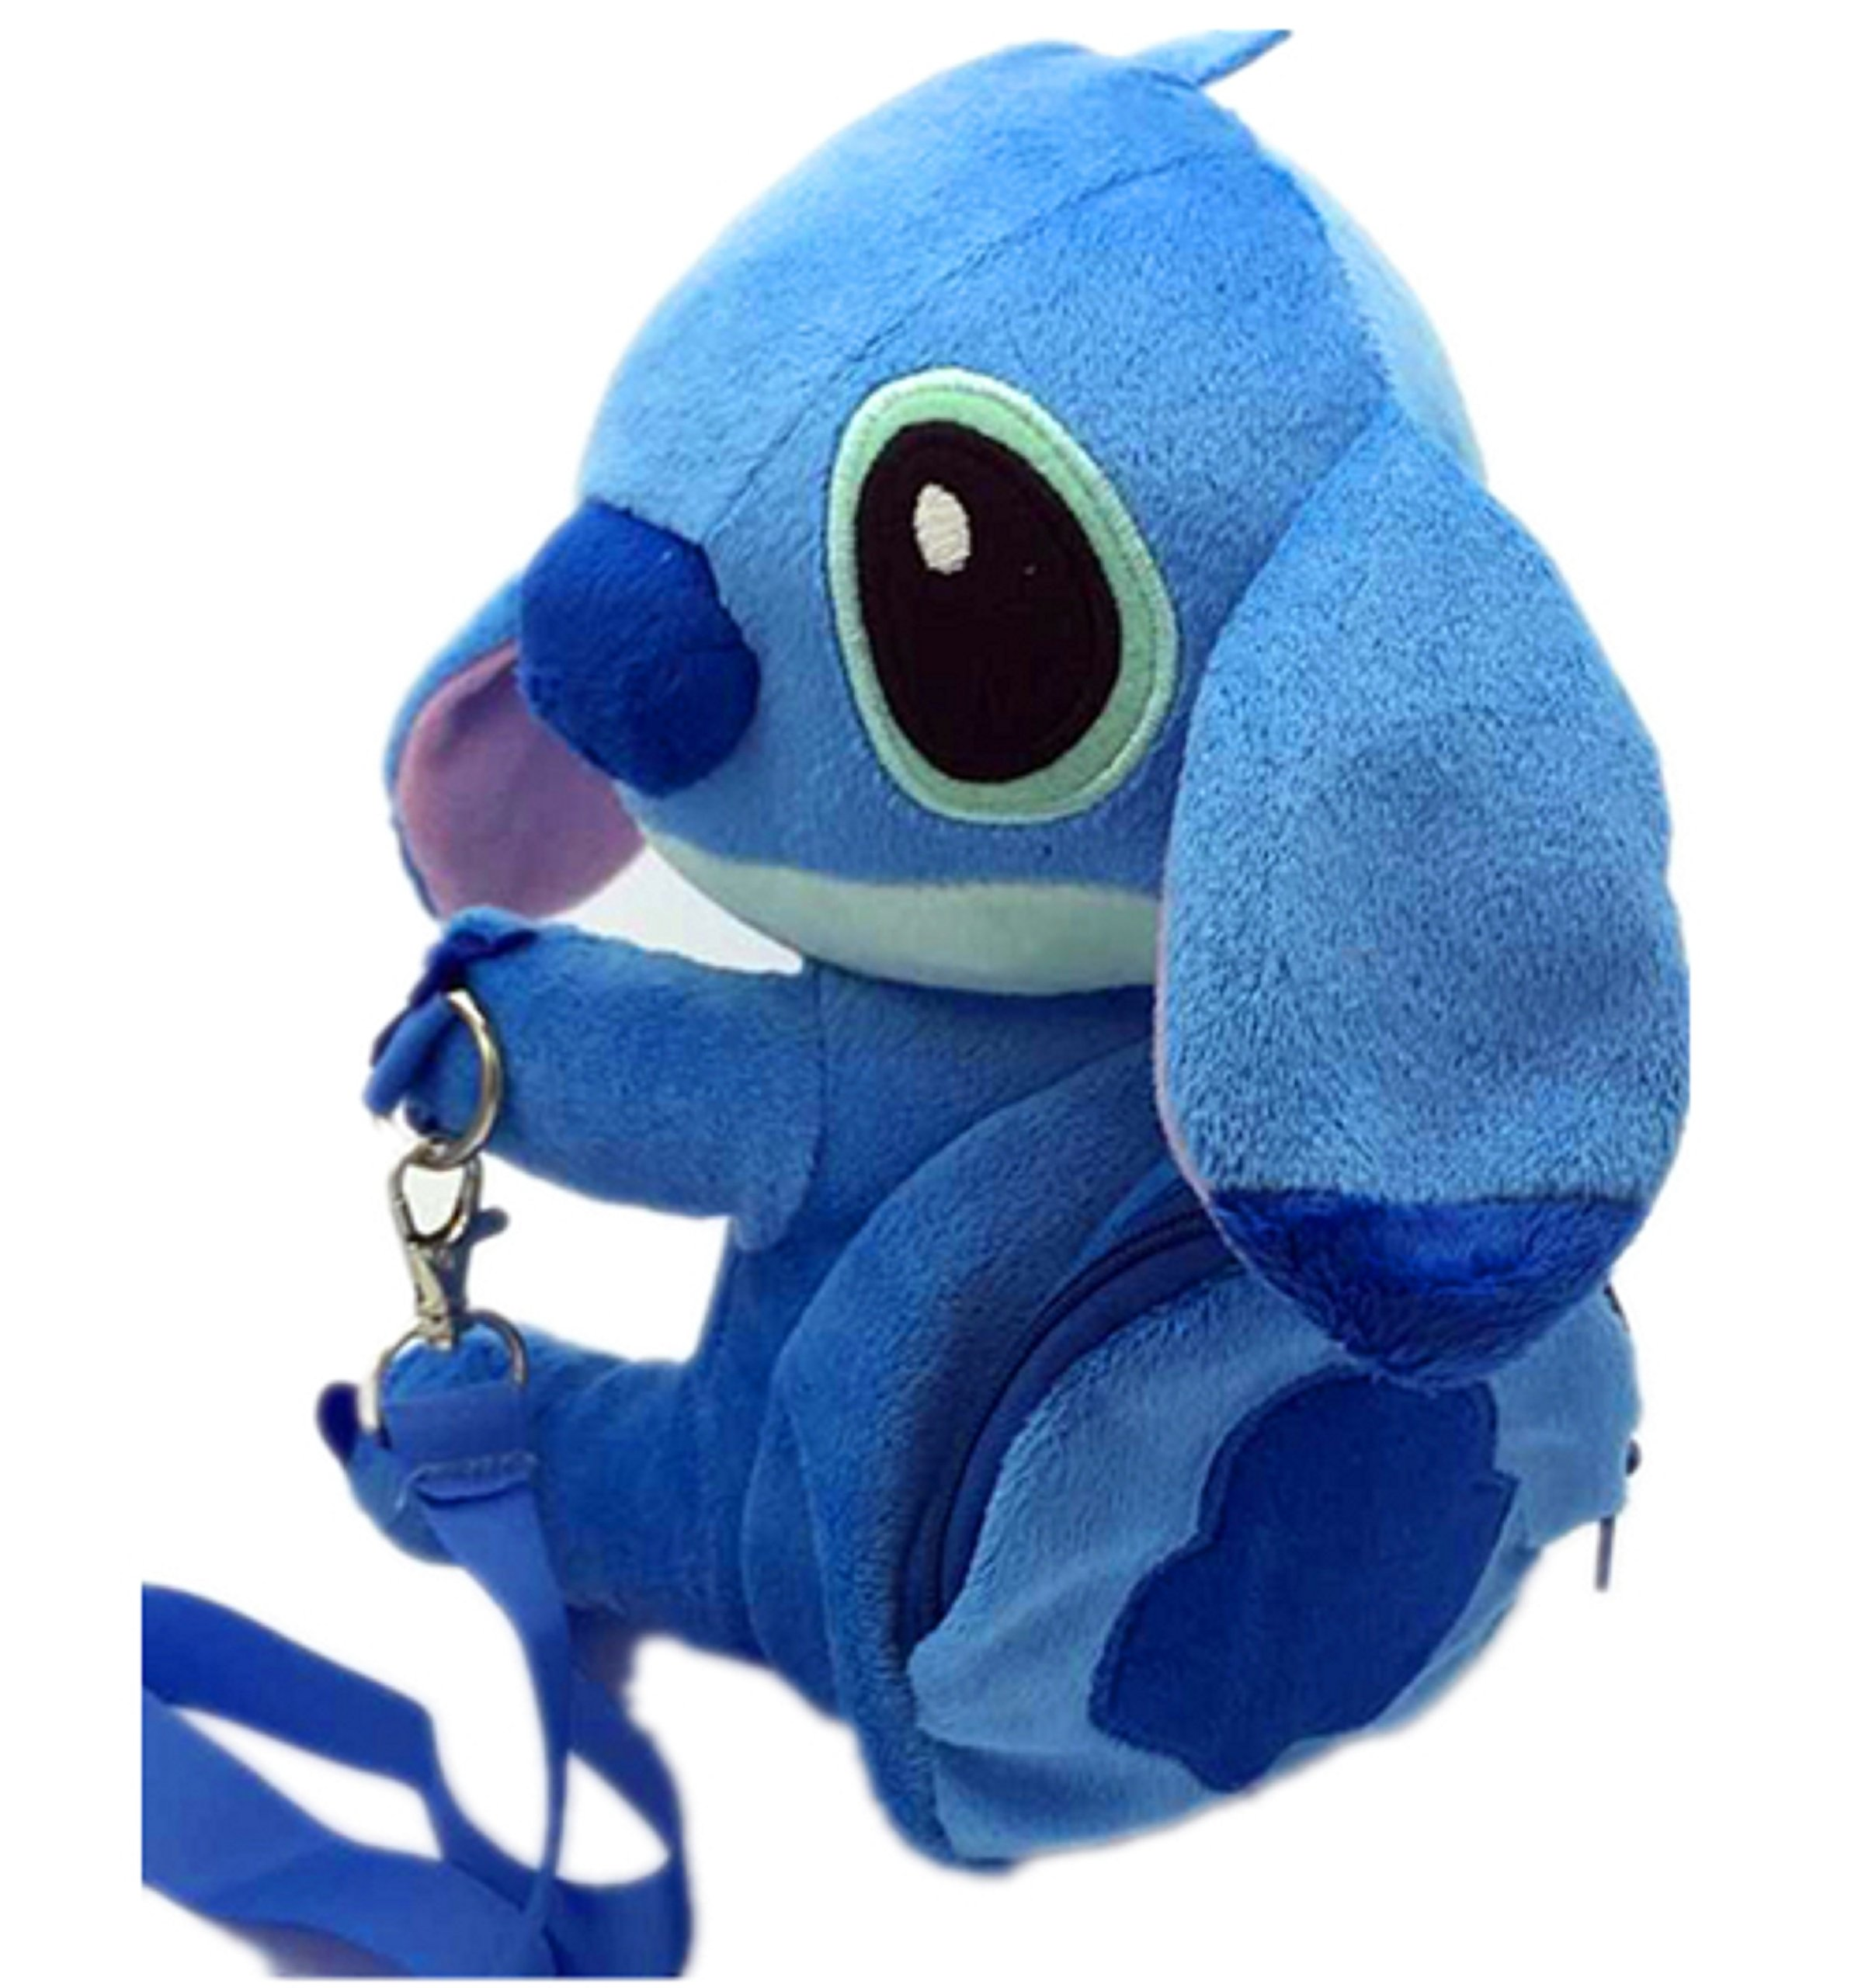 Disney Stitch Set . Soft Plush Crossbody/Shoulder Mini Bag with Small Pocket + Stitch Watch For kids. H 9''. Limited Edition. by LILO & STITCH (Image #7)